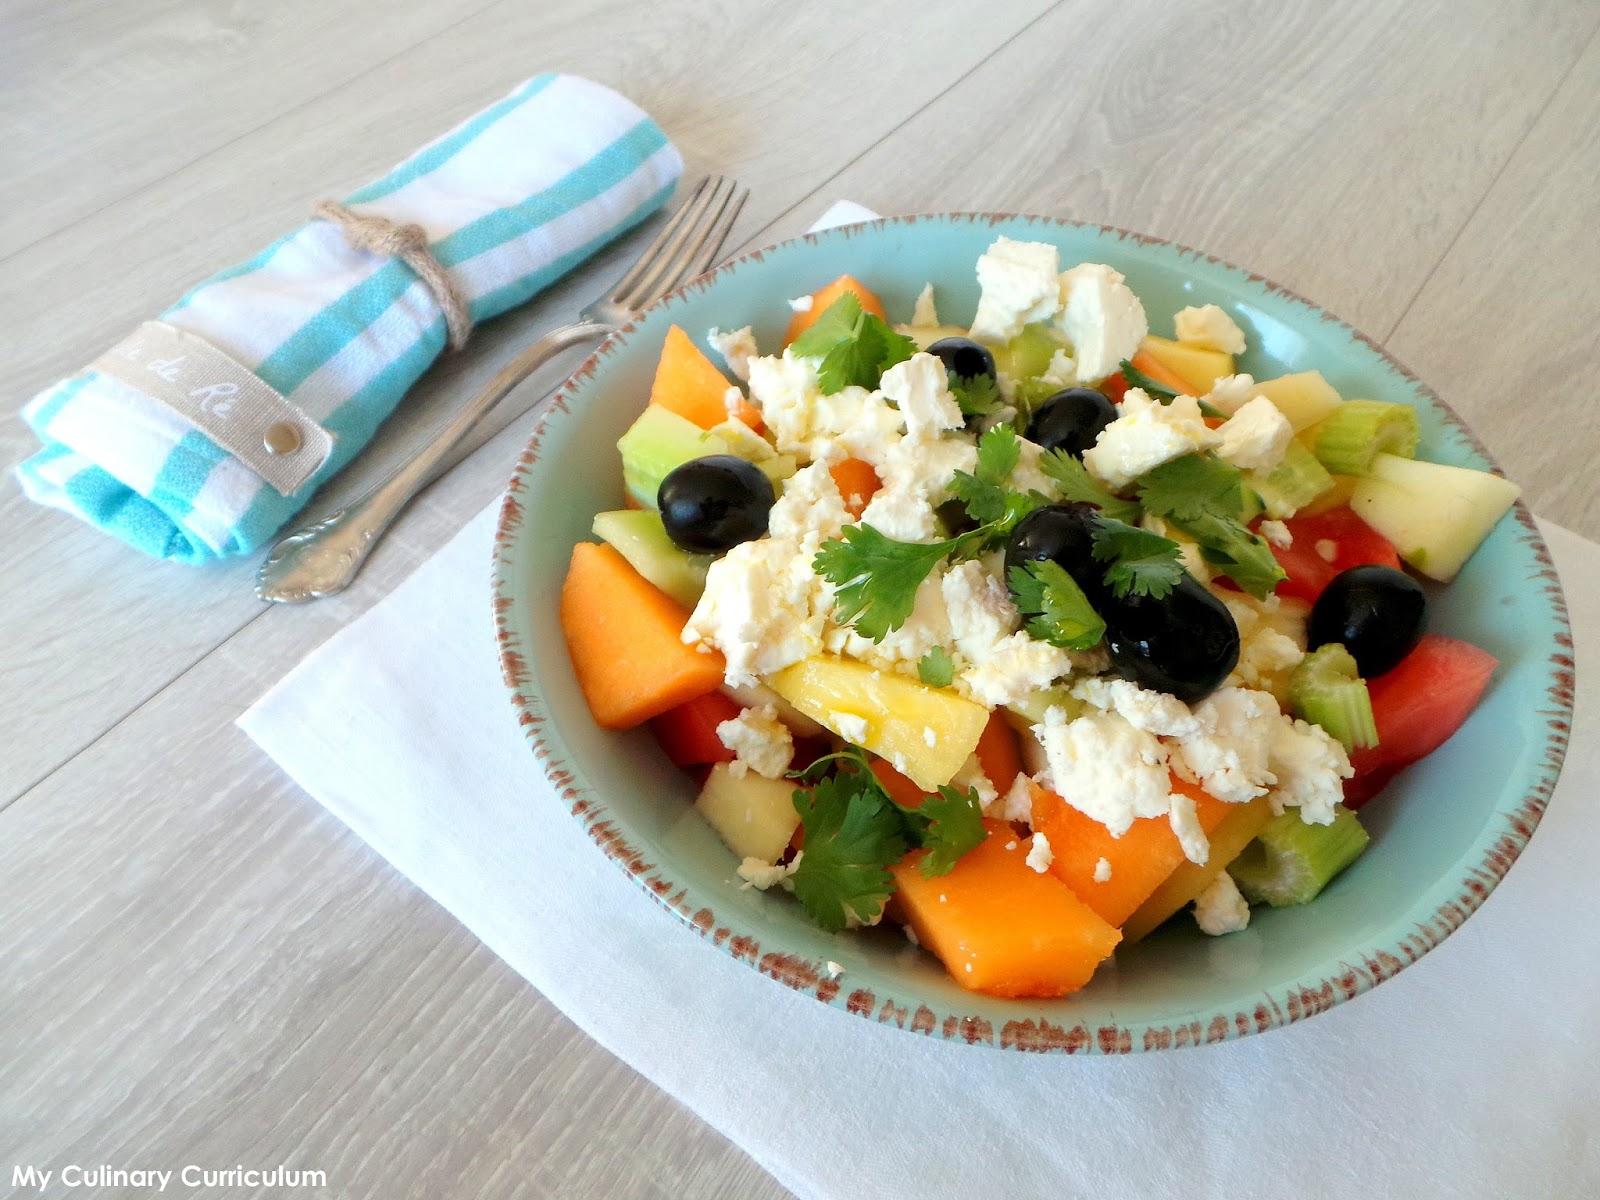 My culinary curriculum salade fra che pour l 39 t melon past que concombre feta c leri - Salade d ete composee ...